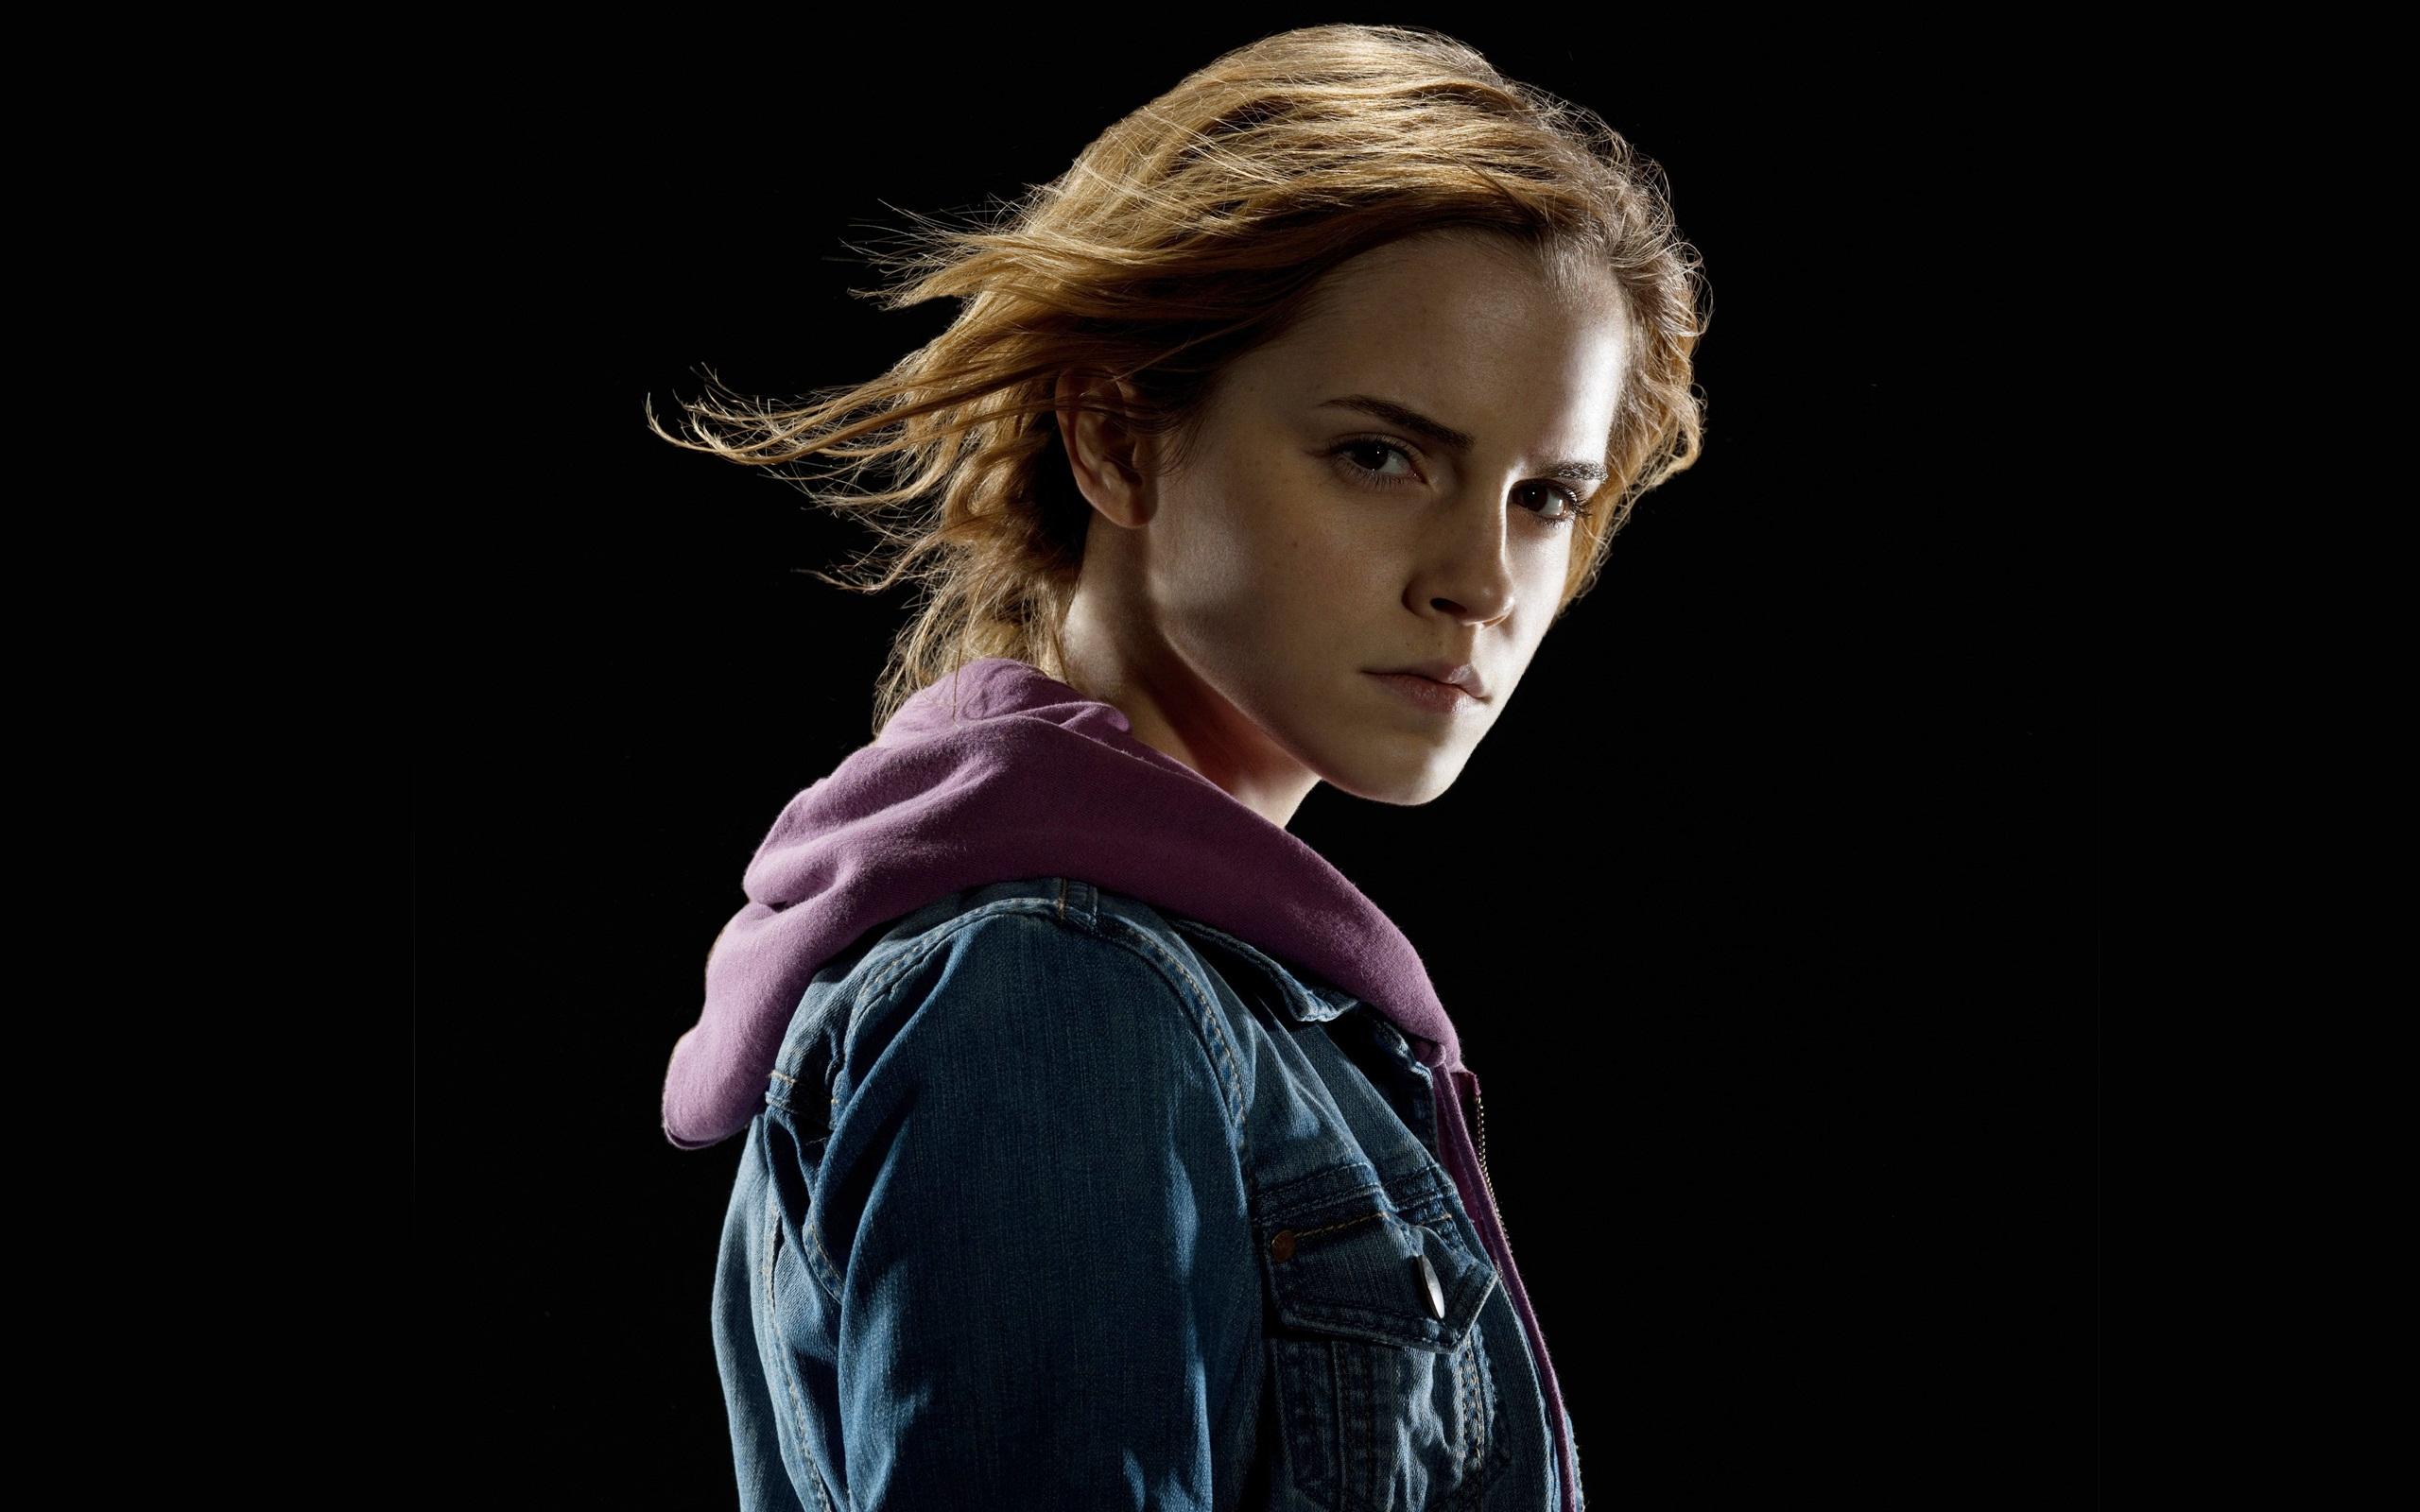 Emma Watson 284 wallpaper download